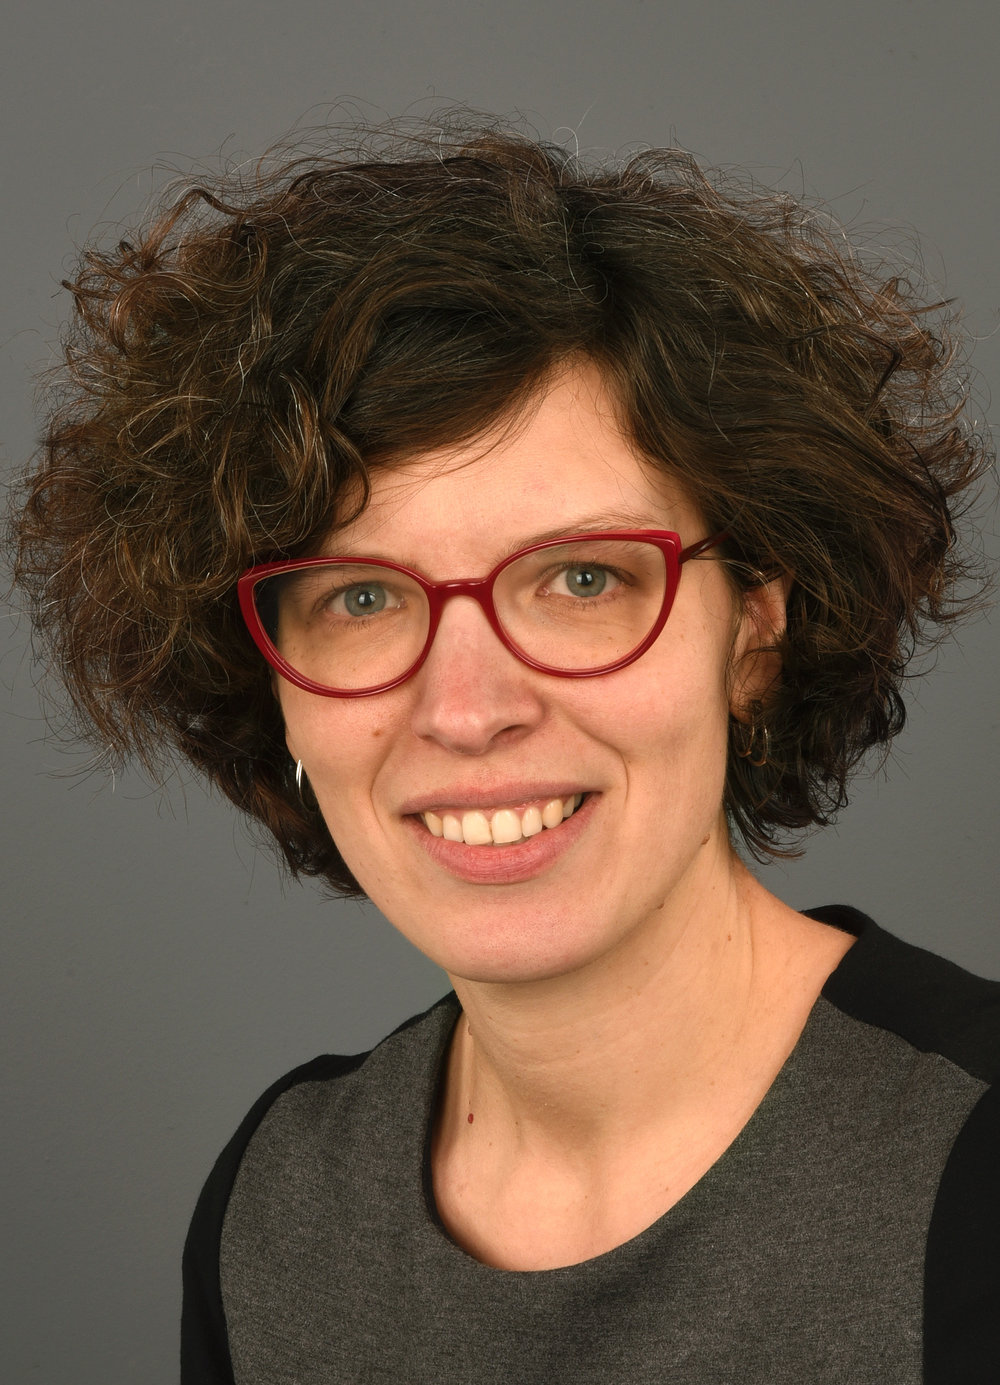 Dr. Caroline van Durme